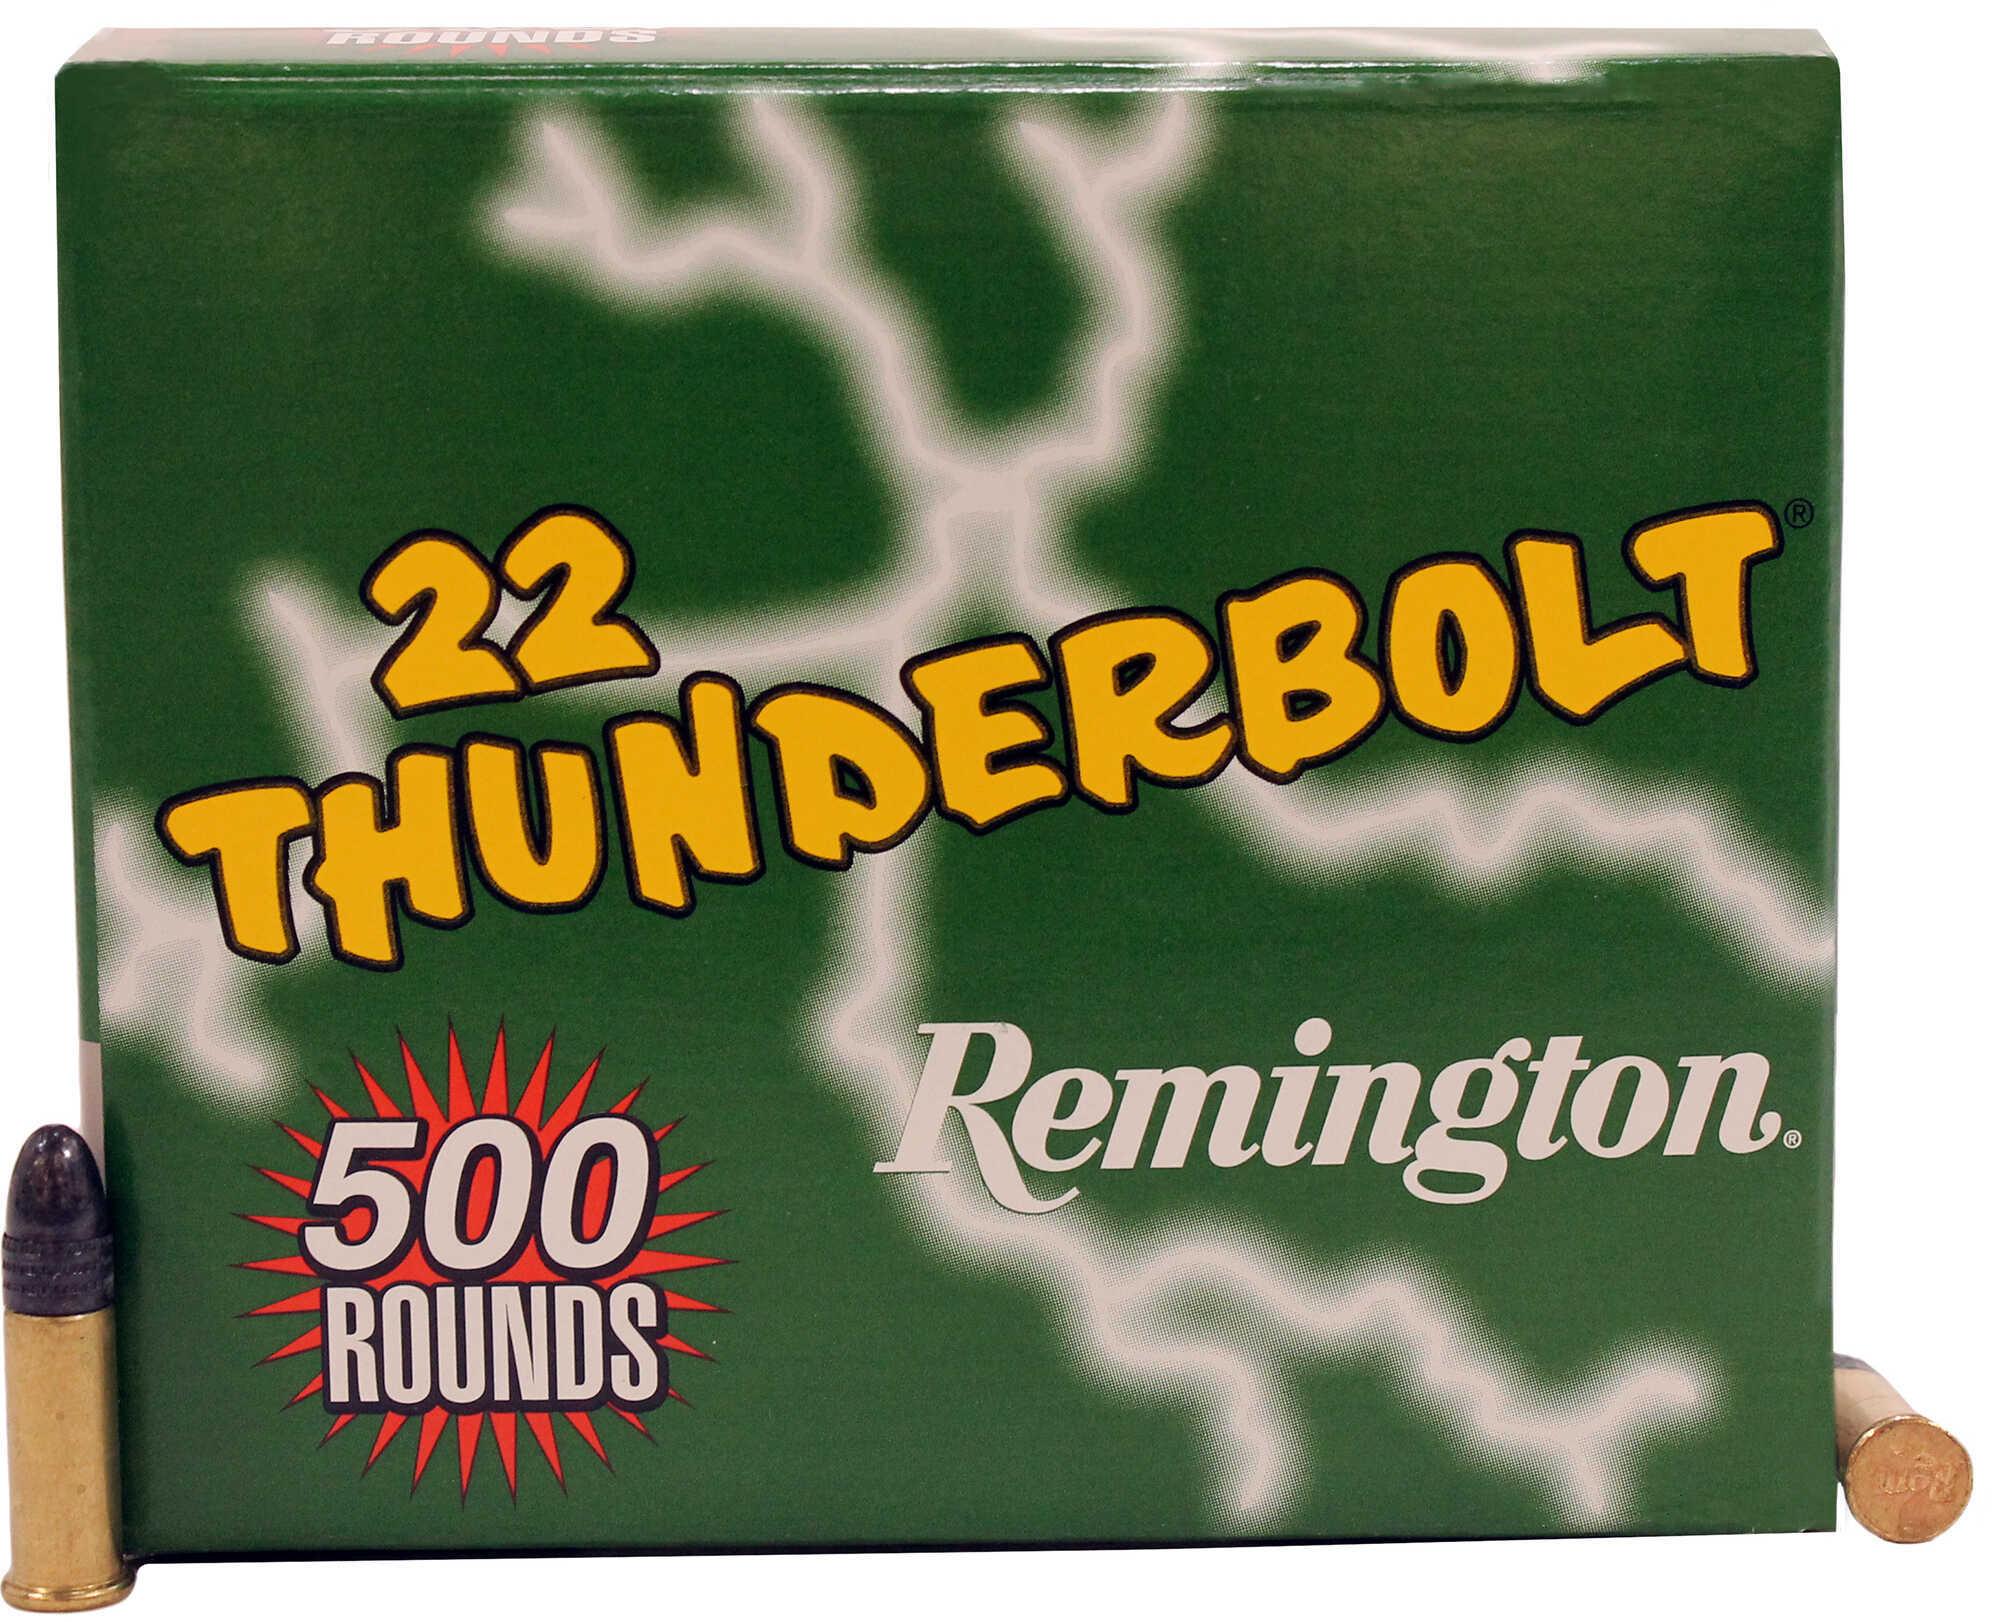 Remington Thunderbolt 22LR 40 Grain Round Nose Hi-Velocity 500 Round Case 21241